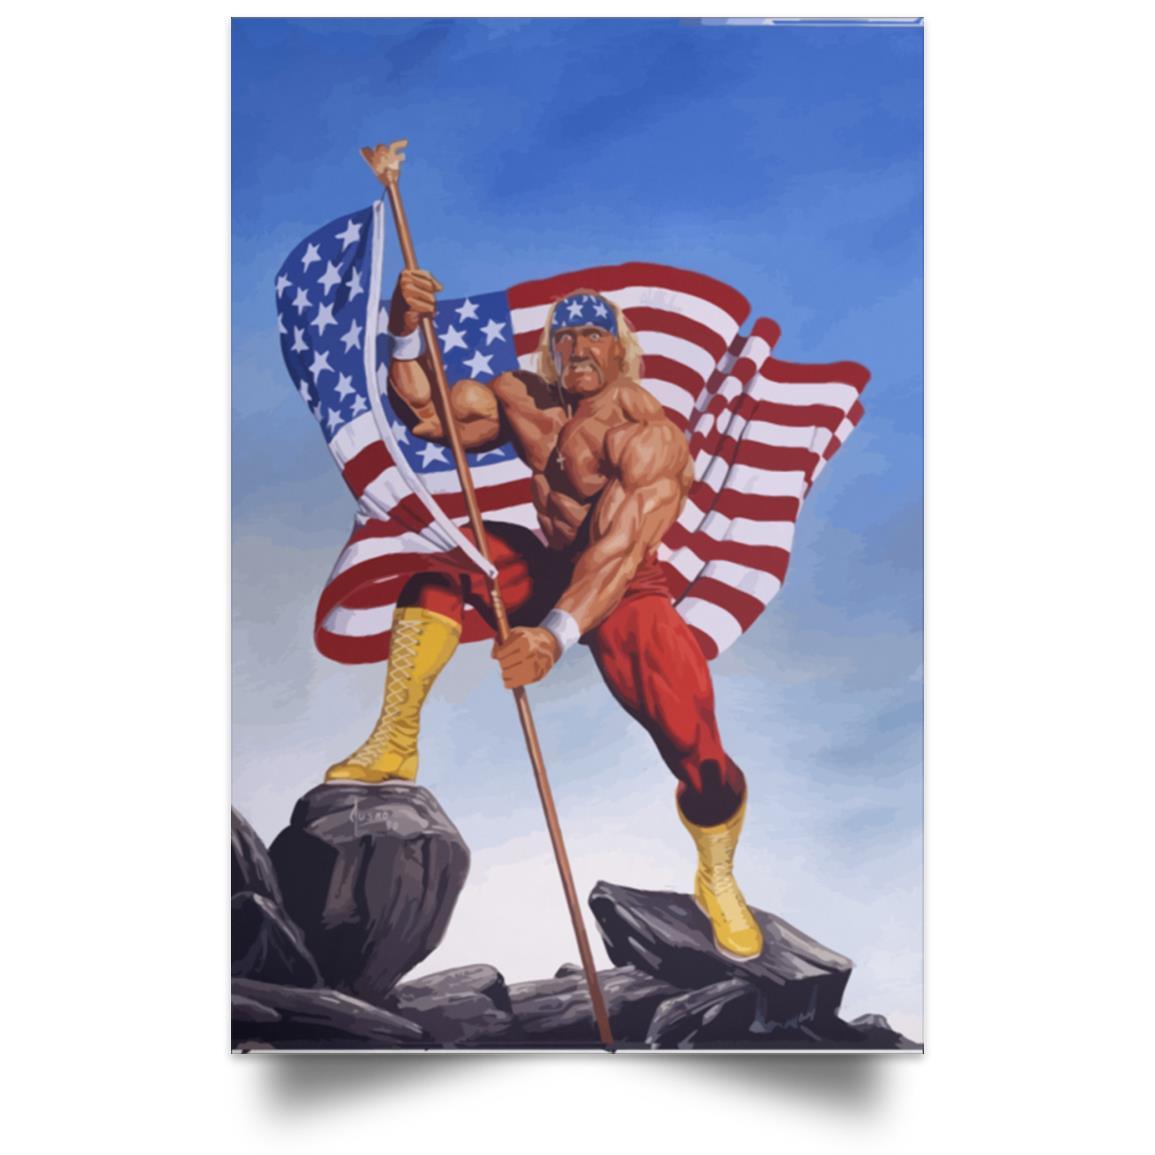 HULK HOGAN AMERICAN FLAG POSTER 1